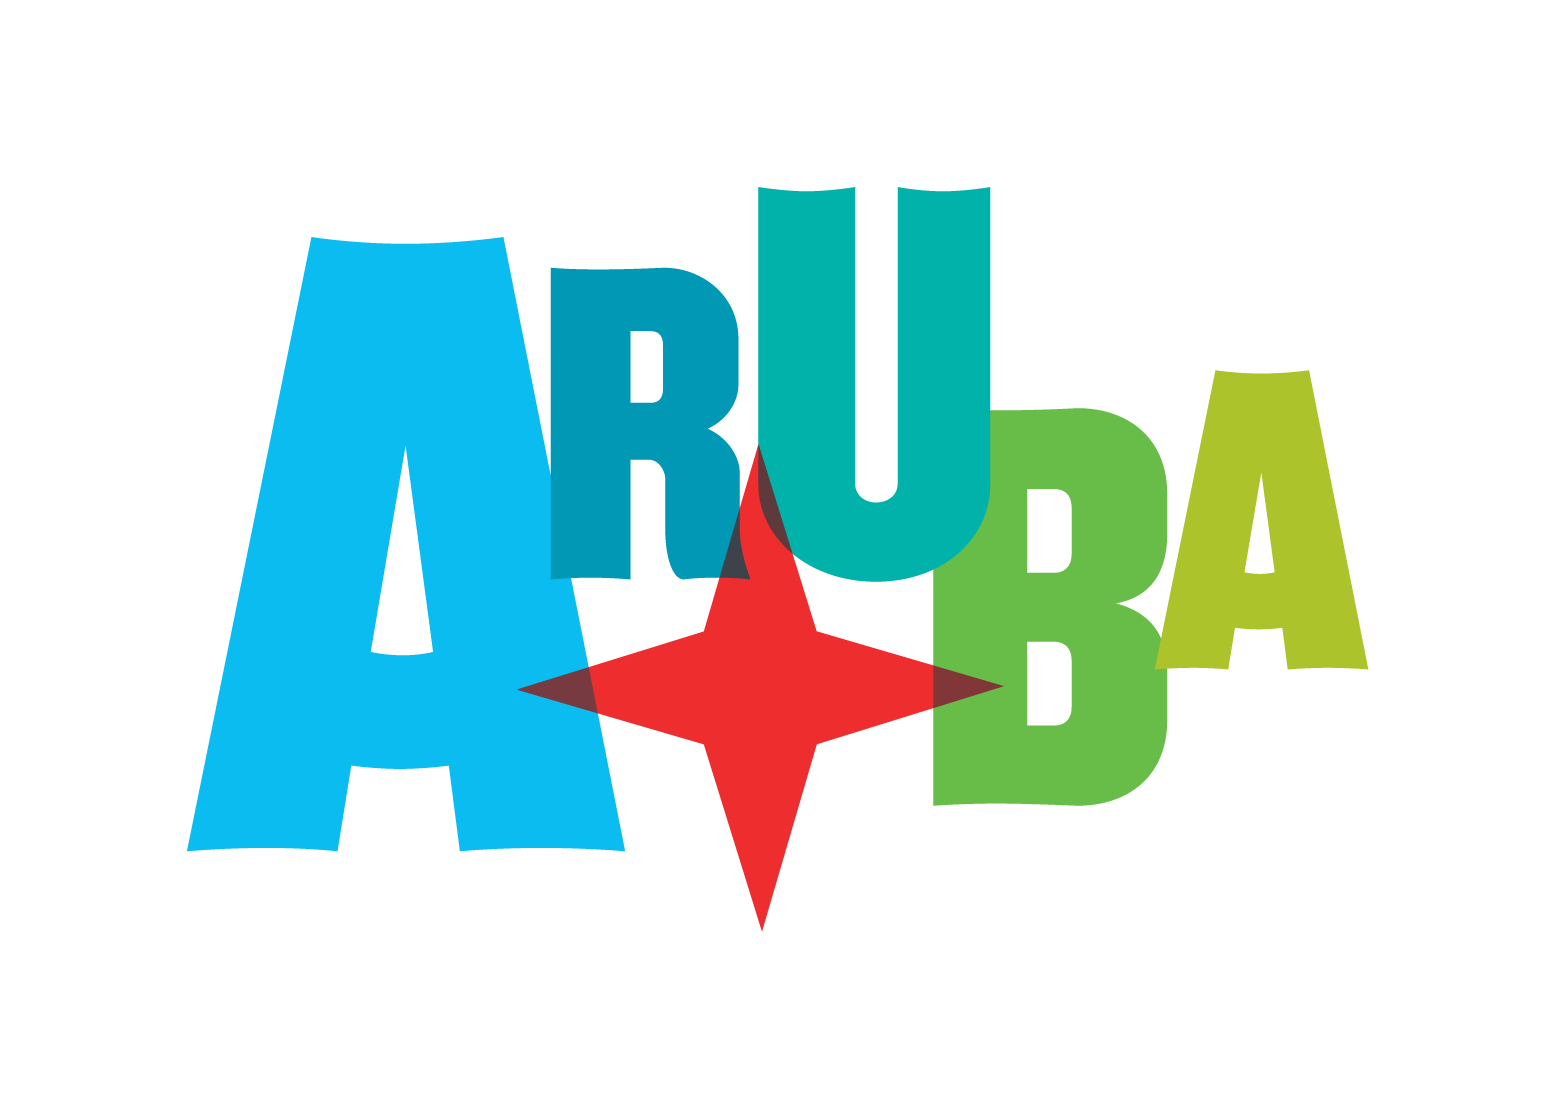 ArubaLogo.png - Aruba PNG